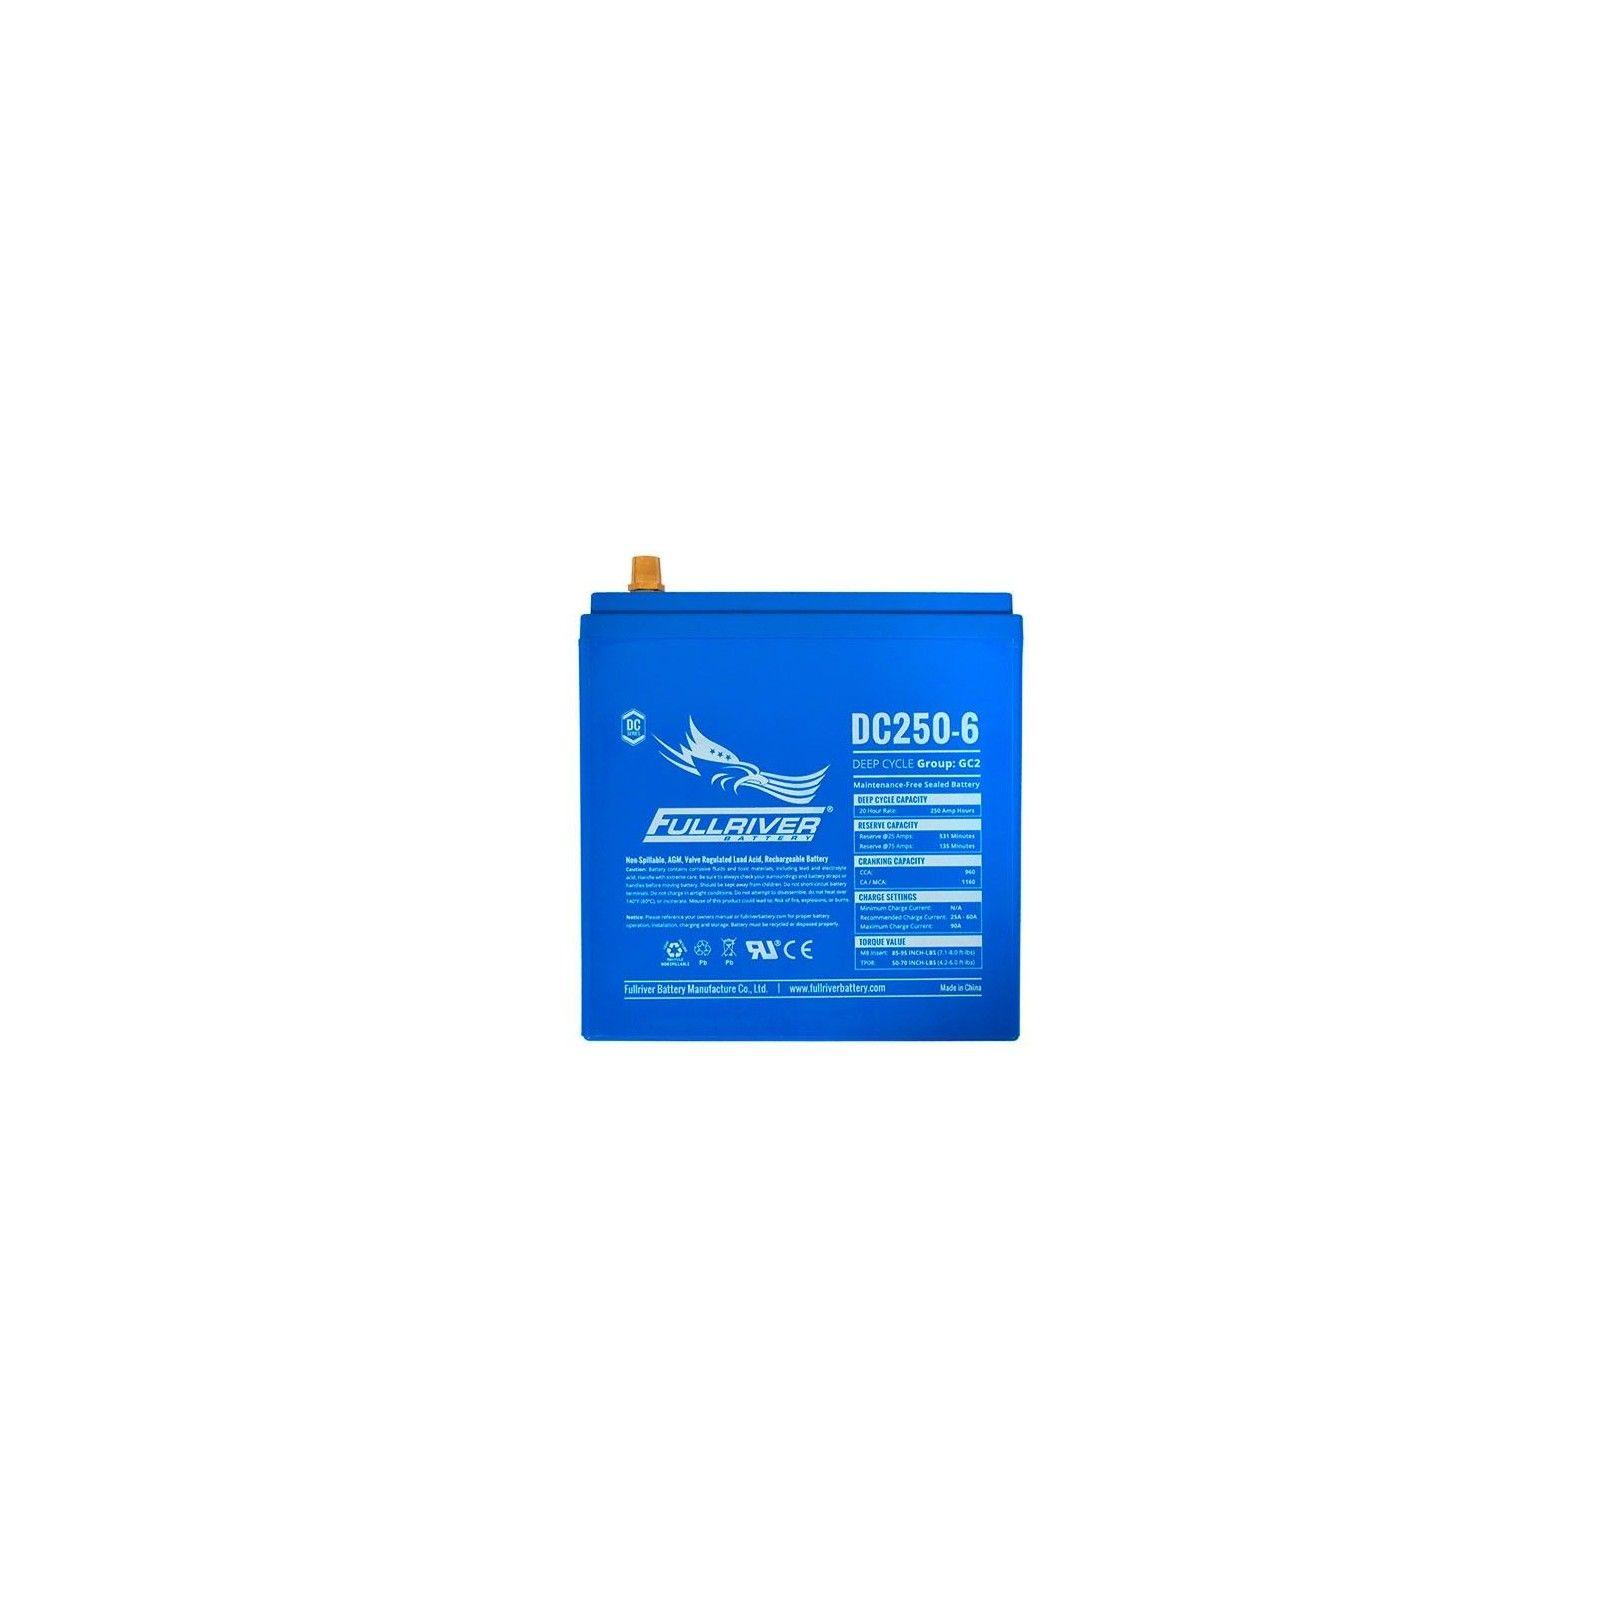 Battery Fullriver DC250-6 250Ah -A 6V Dc FULLRIVER - 1